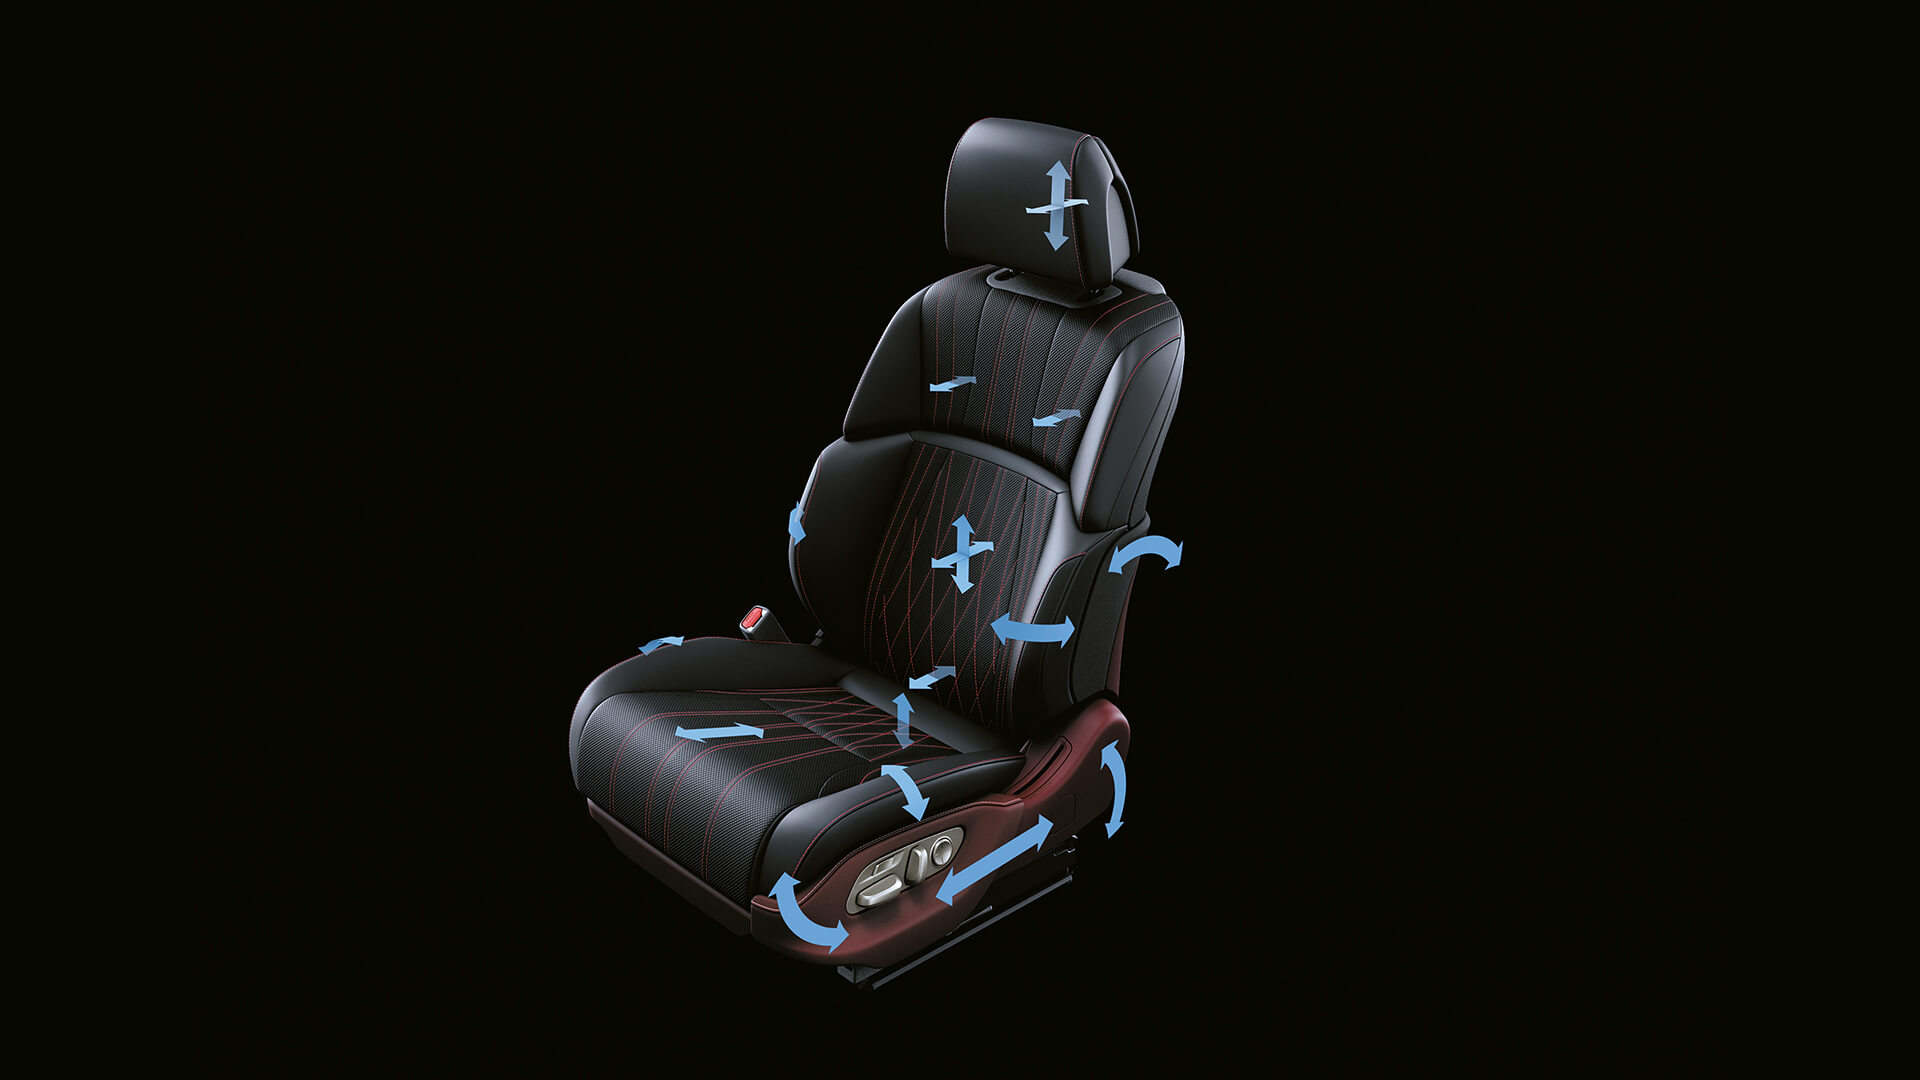 2018 lexus ls features front seat adjustment and massage